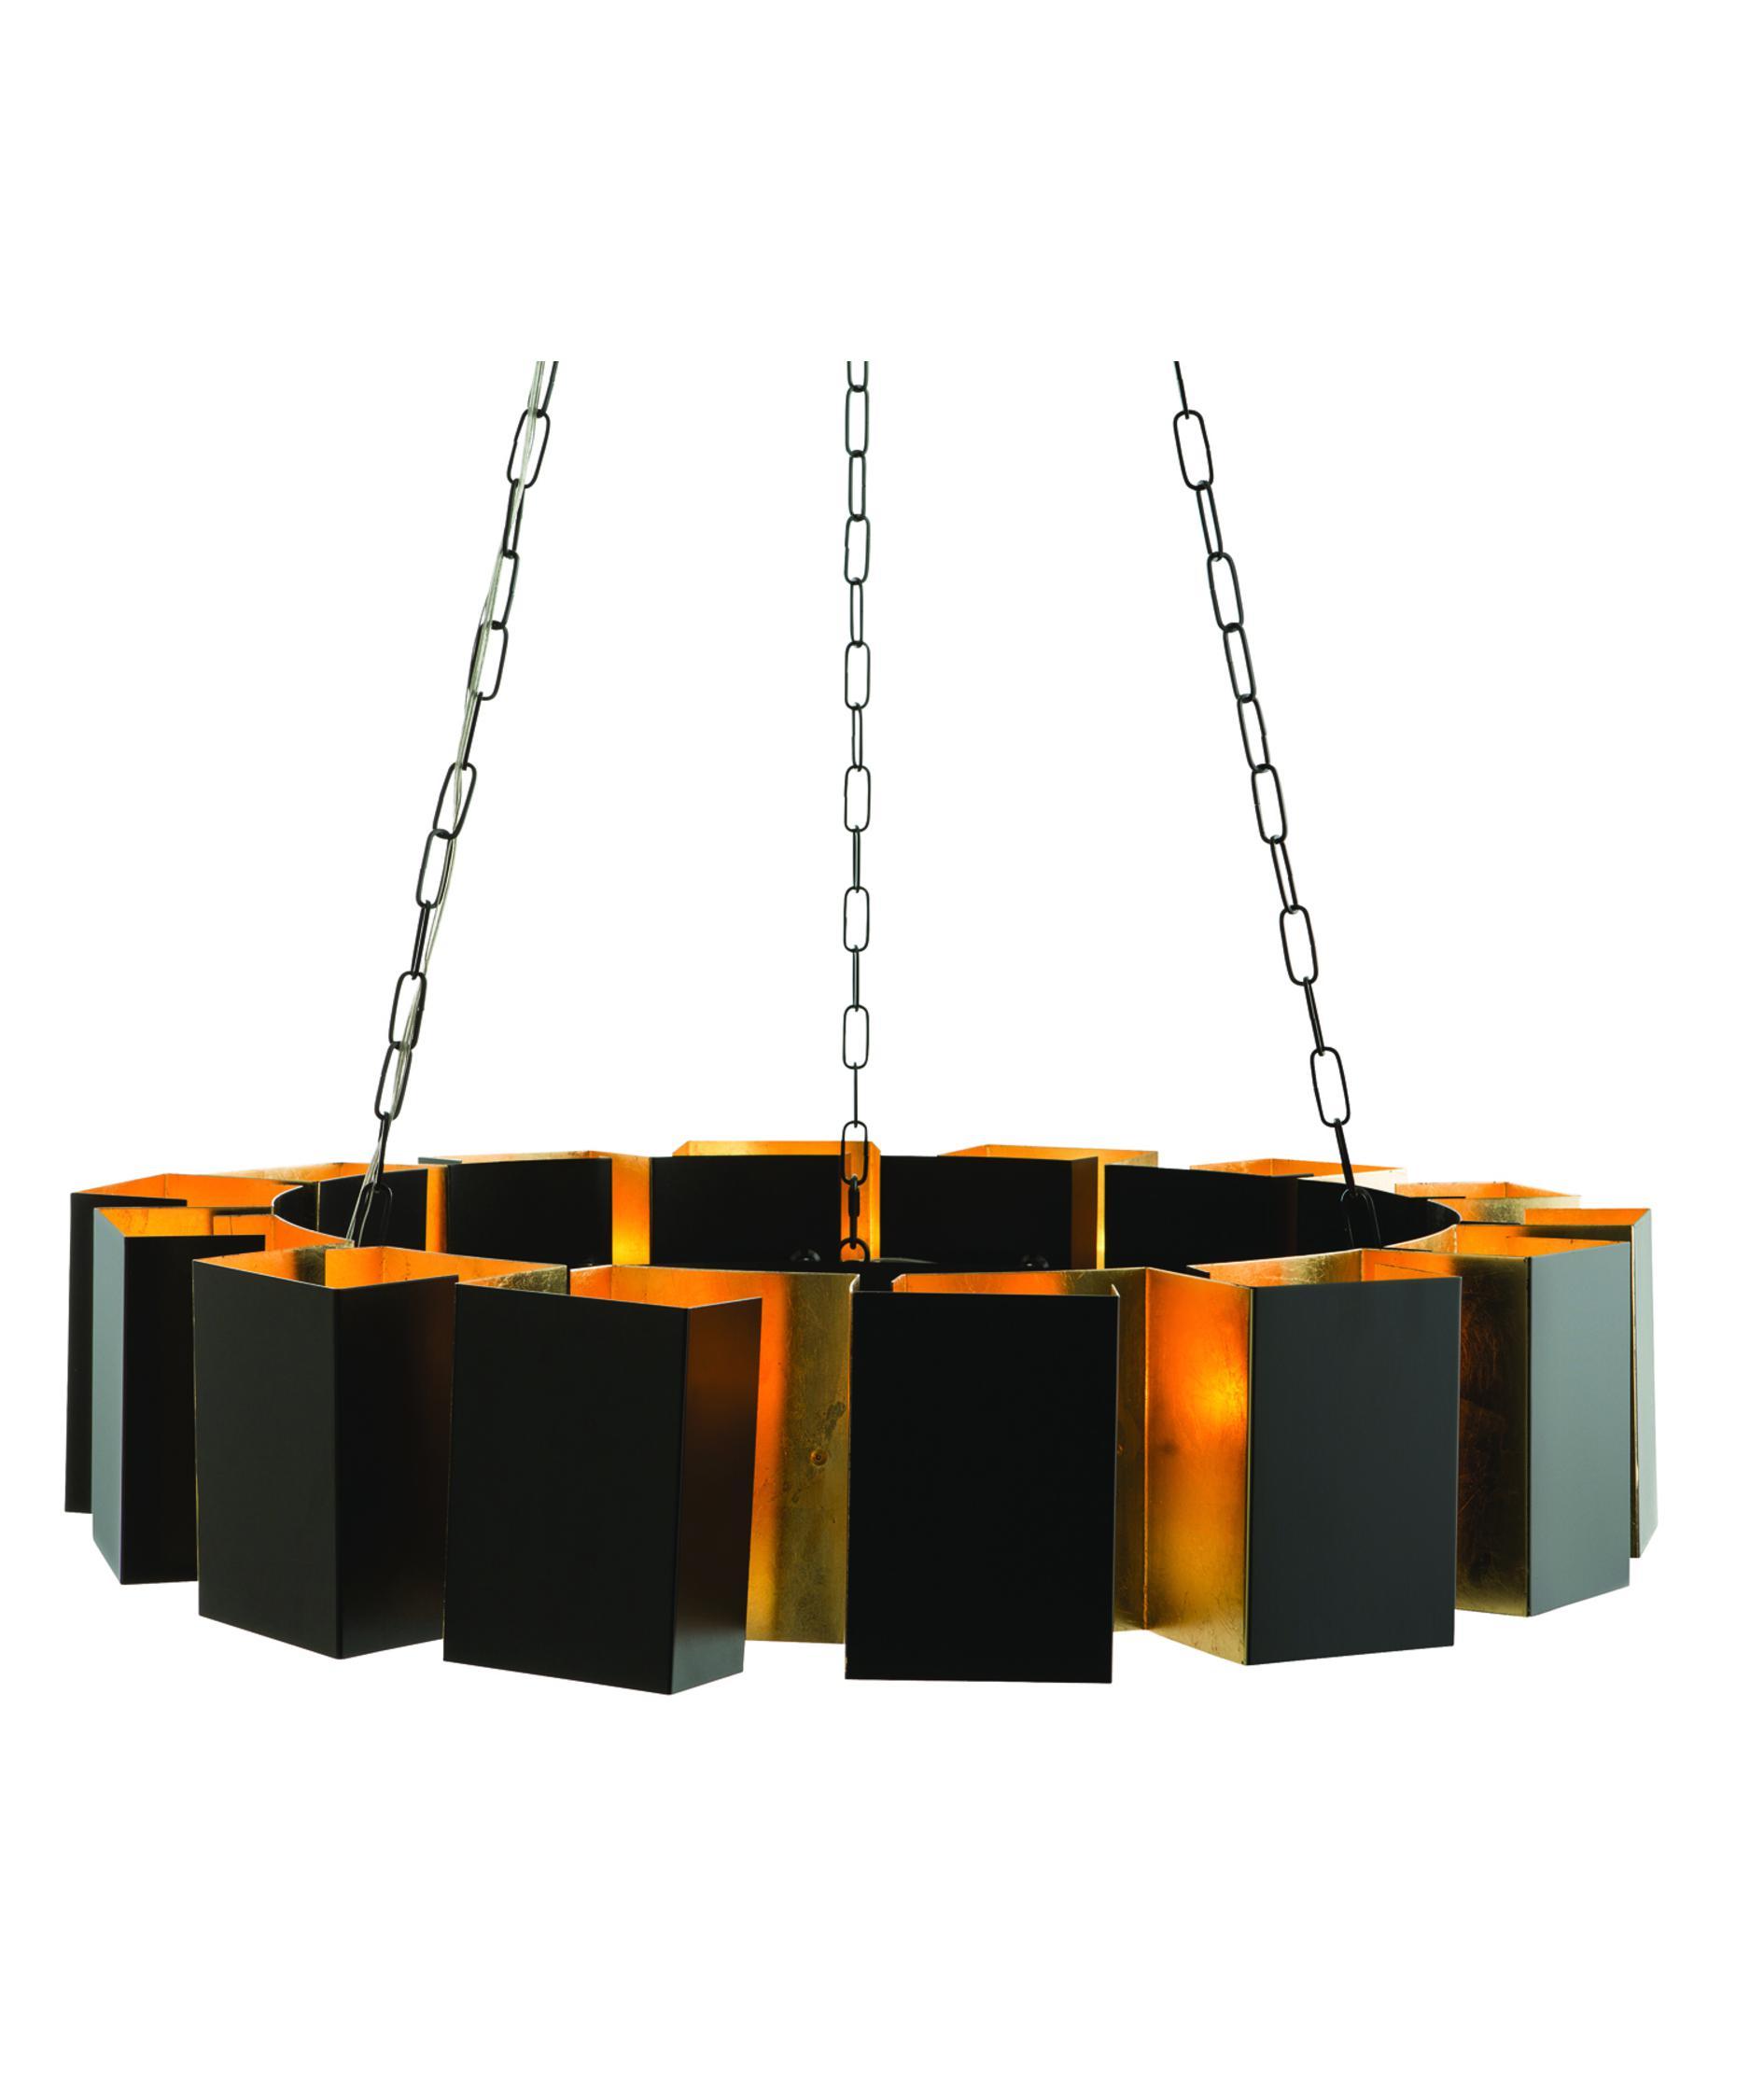 Arteriors | Arteriors Caviar Pendant | Arteriors Lamp